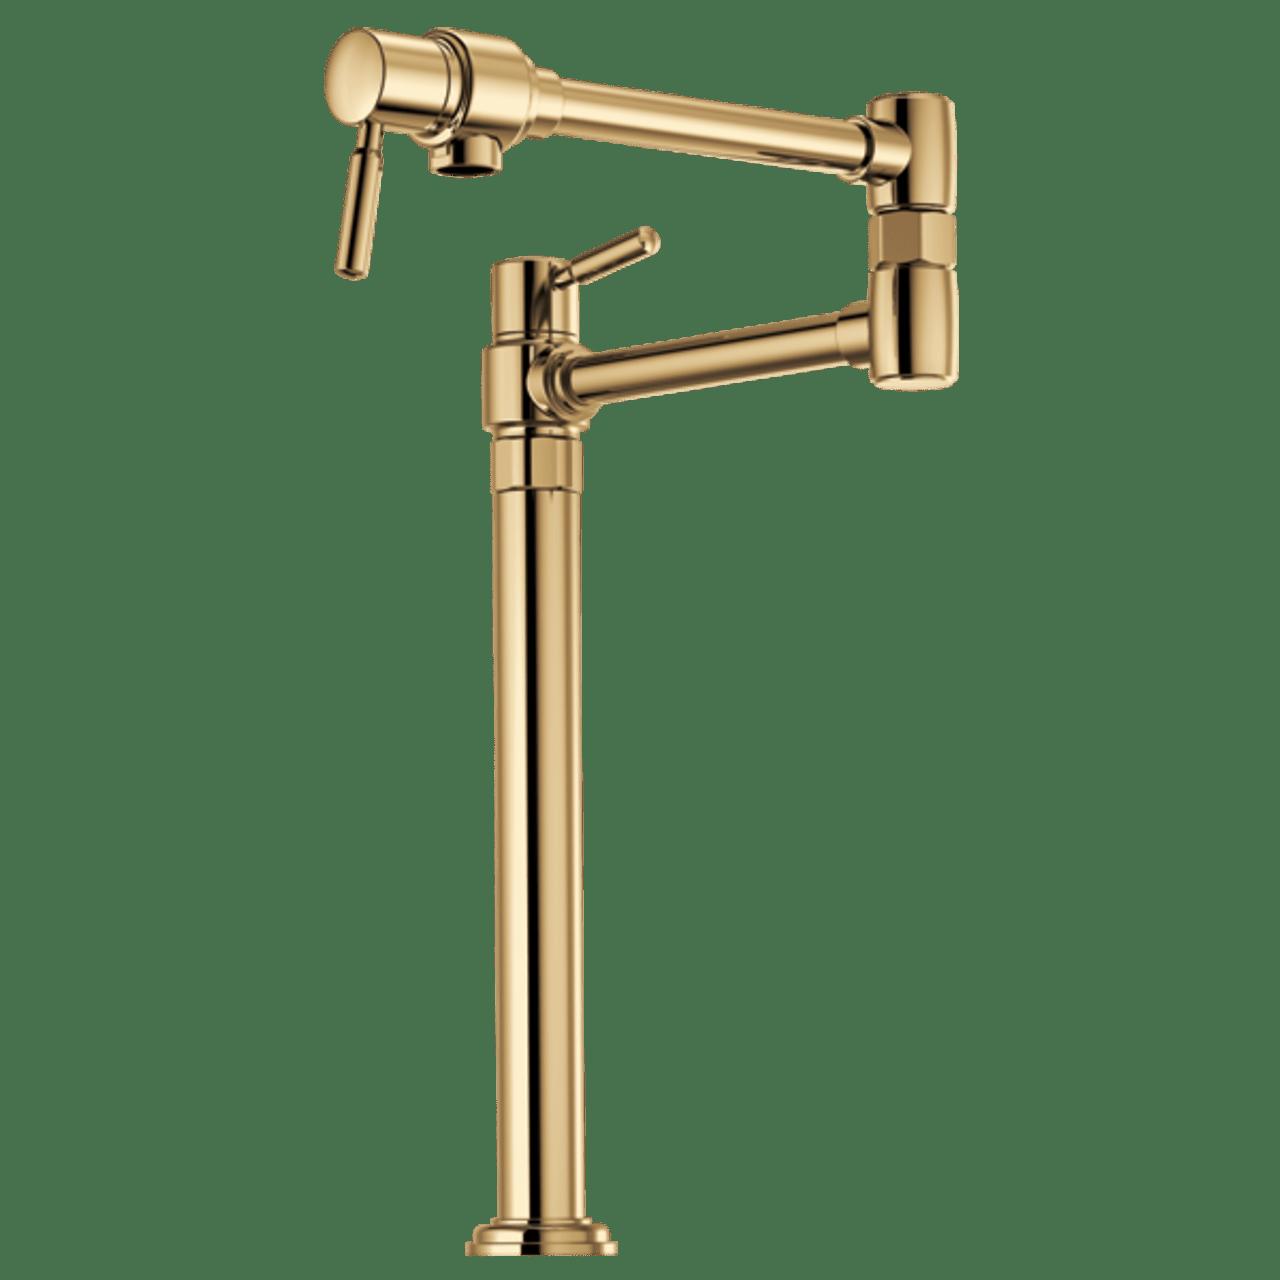 brizo euro deck mount pot filler faucet in polished gold